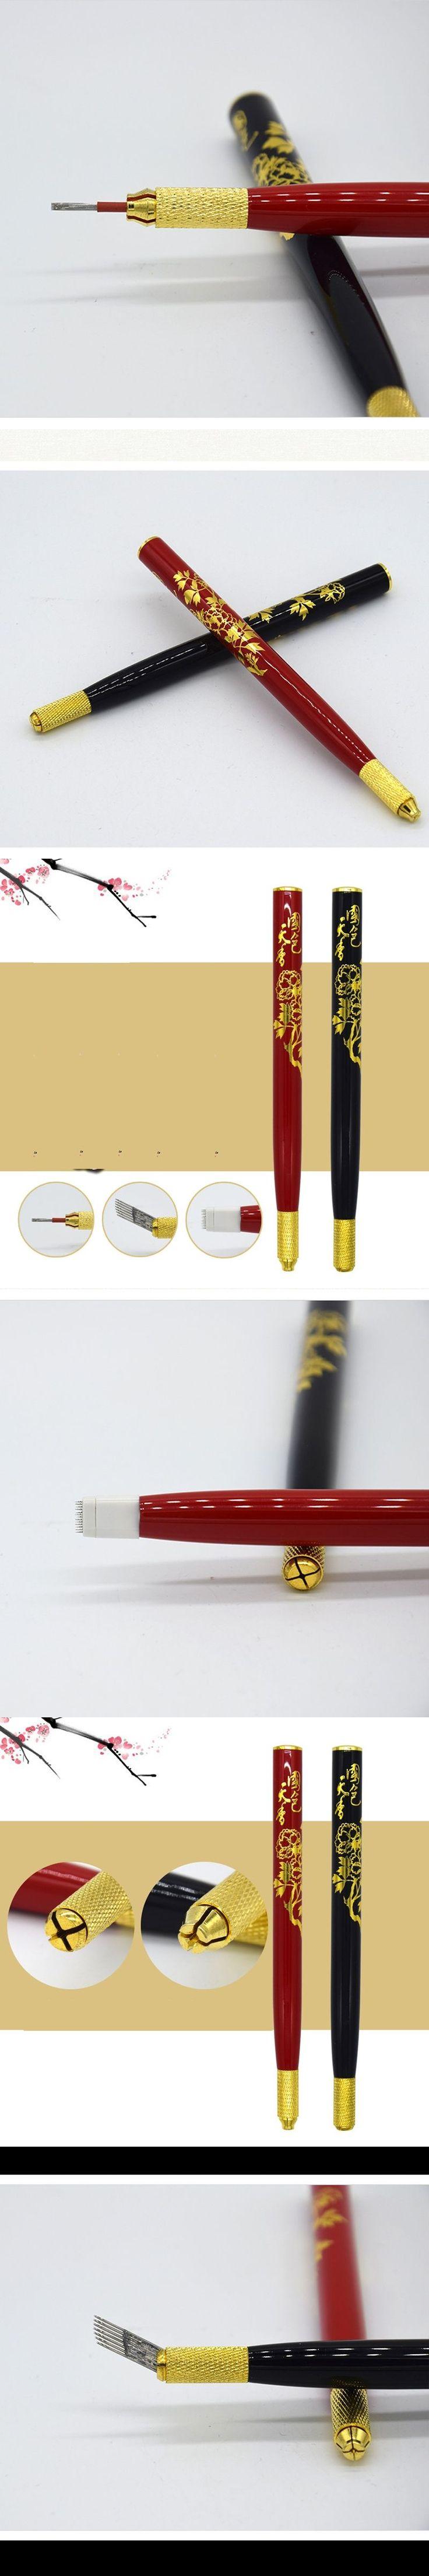 Professional Tebori Eyebrow Tattoo Pen Permanent Makeup Pen Machine Microblade Pen for Lip and Eyebrow Tattoo Equipment